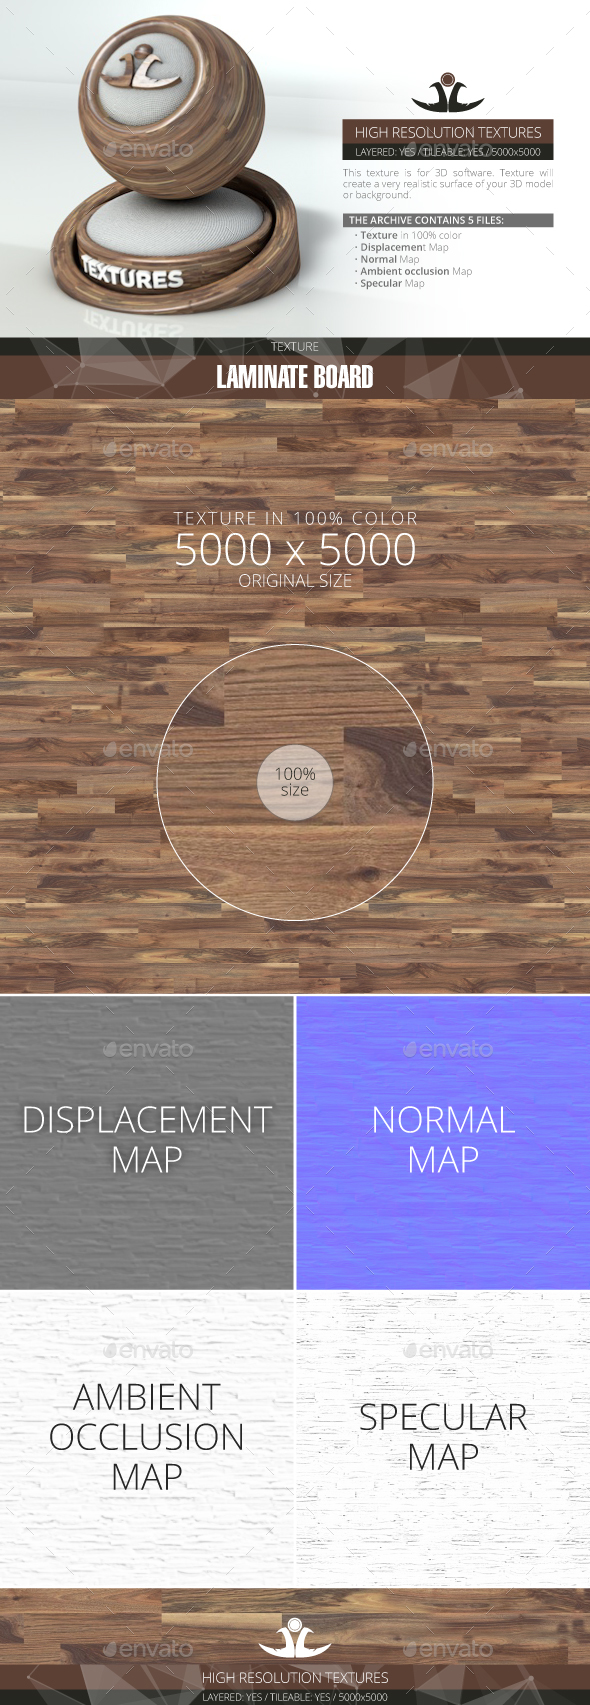 Laminate Board 64 - 3DOcean Item for Sale